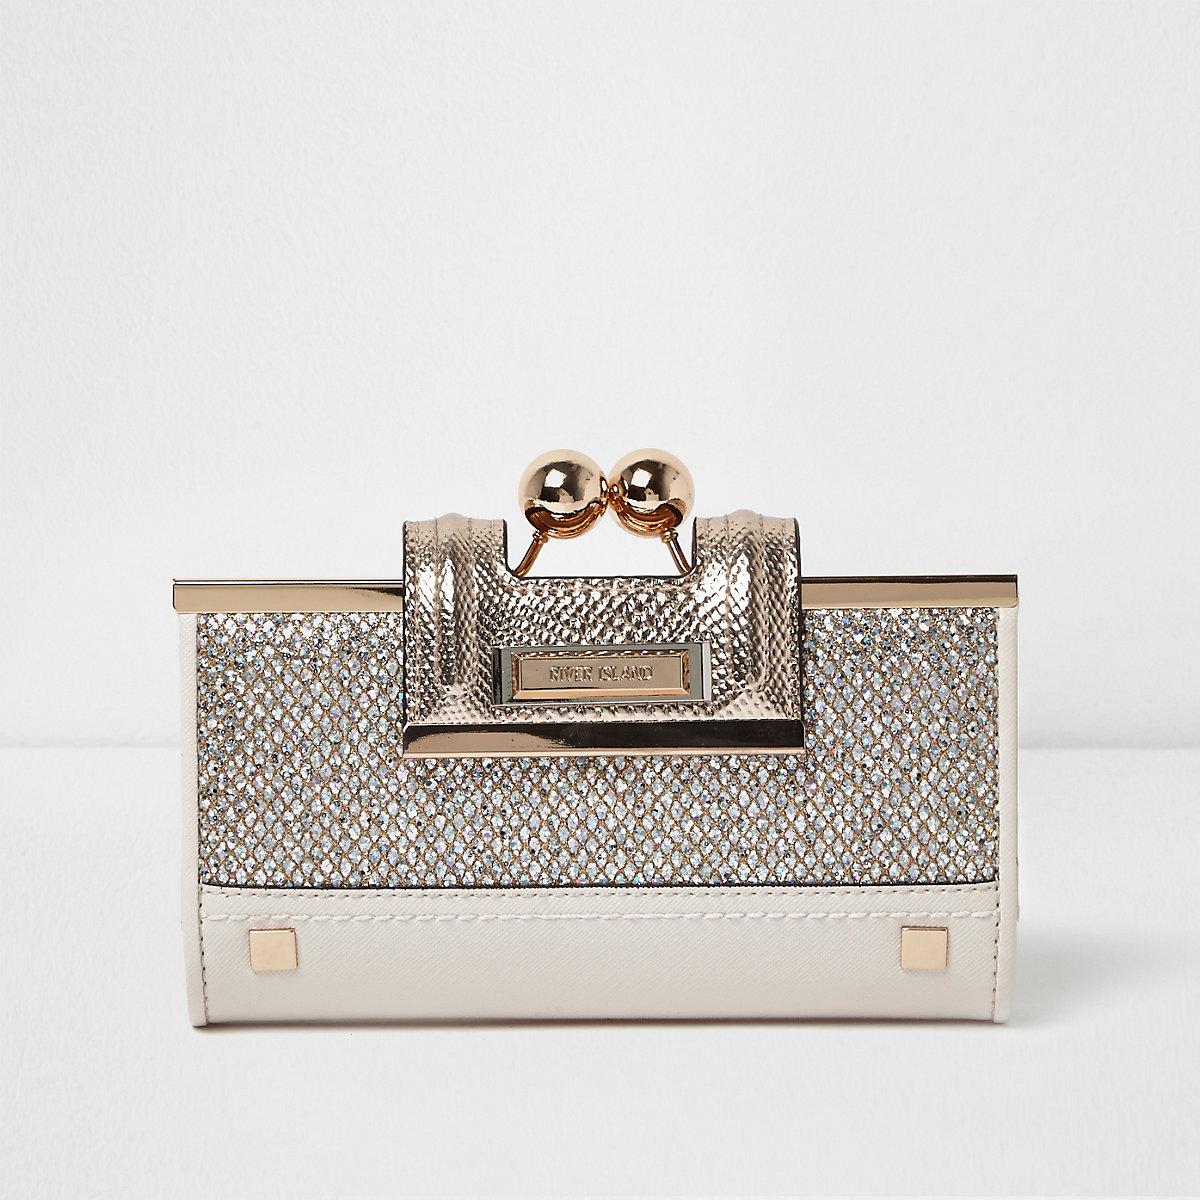 Gold glitter ball clip top purse - Purses - Bags   Purses - women fc89338b0829